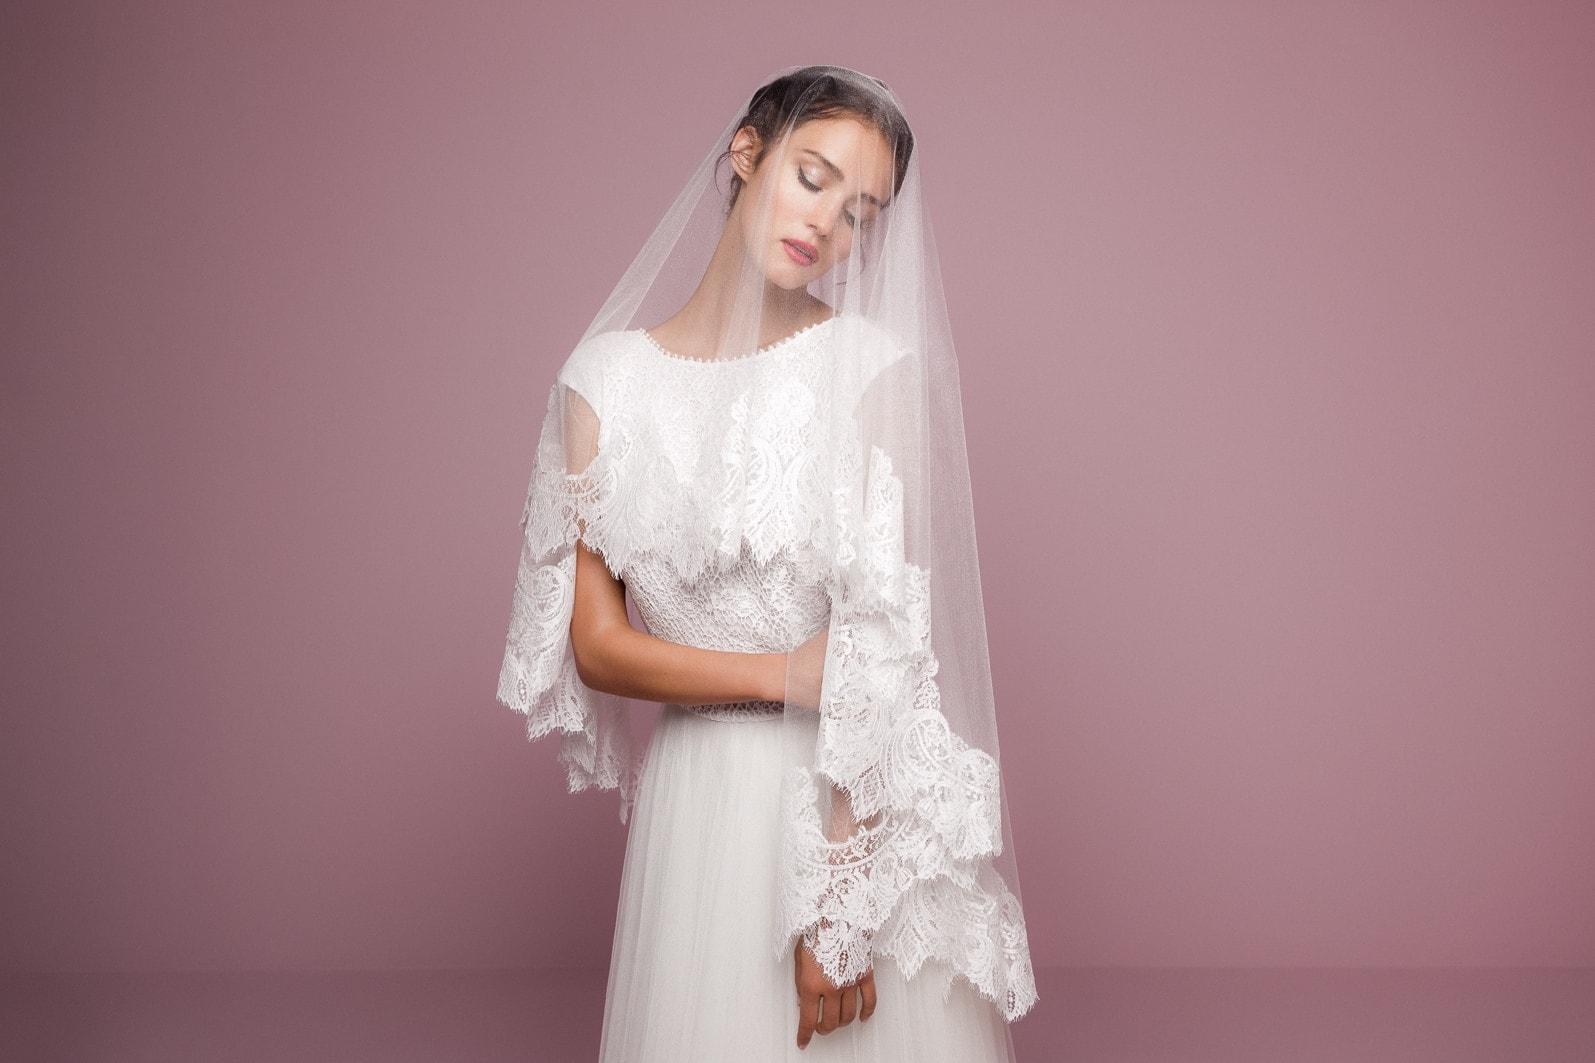 eee81335633d Daalarna Couture Trunk Show! - Wedding Dresses & Bridal Store ...